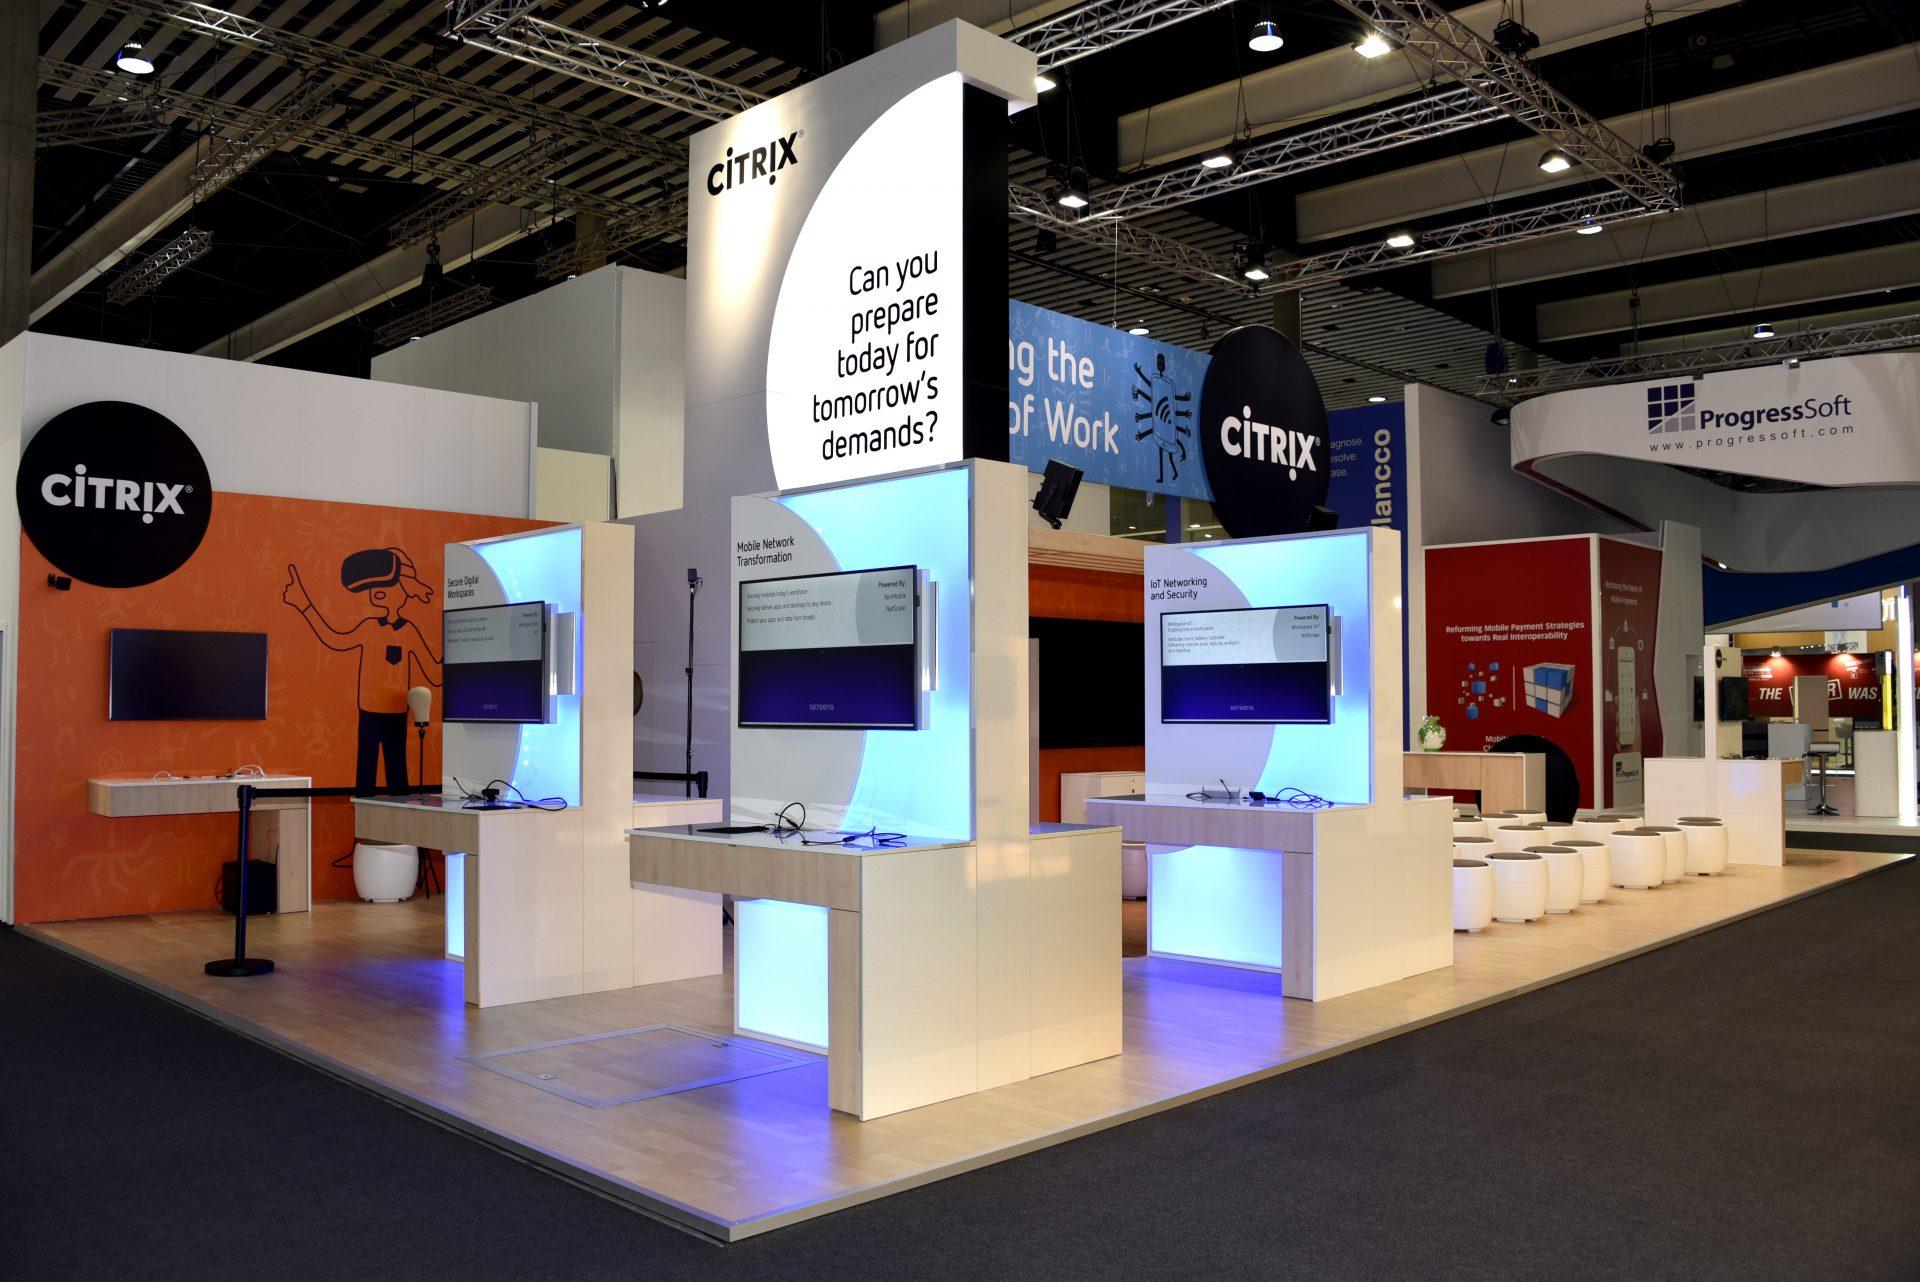 CITRIX / MG Design / MWC Mobile World Congress, Barcelona/Spain